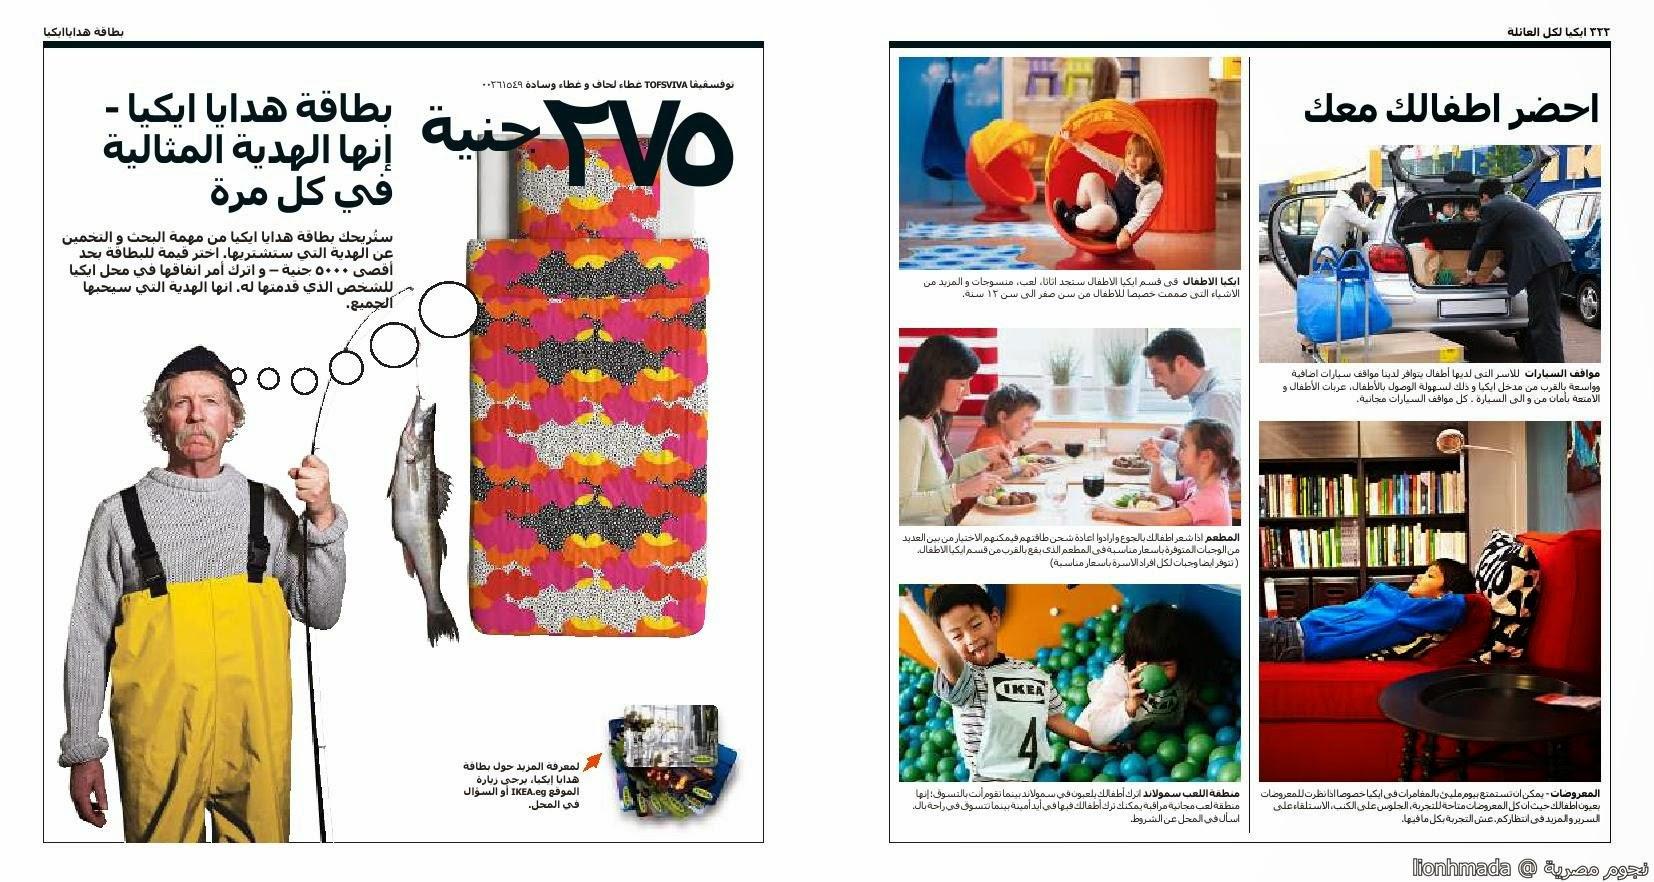 imgeaa870c838699bcf7bb6cc6c108b9282 صور كتالوج ايكيا مصر ikia للديكورات